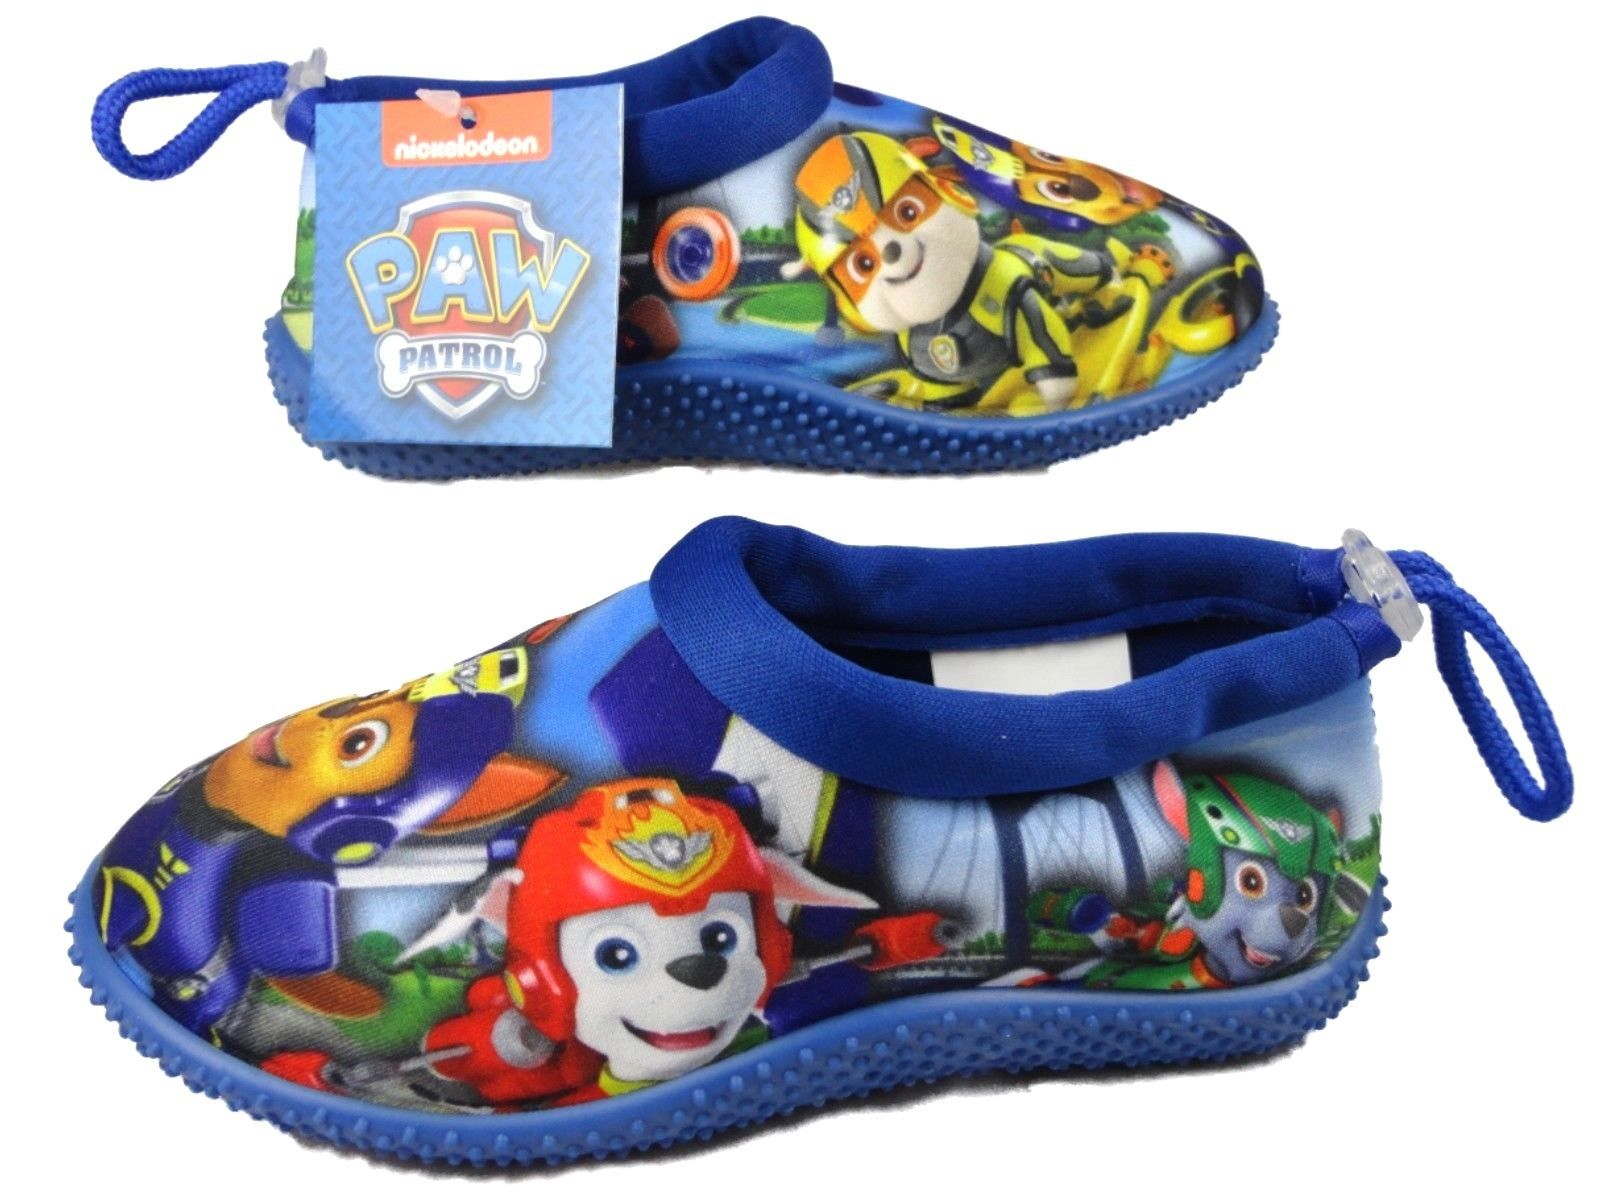 9 95 GBP Boys Paw Patrol Surf Aqua Sock Beach Swim Water Shoes 5